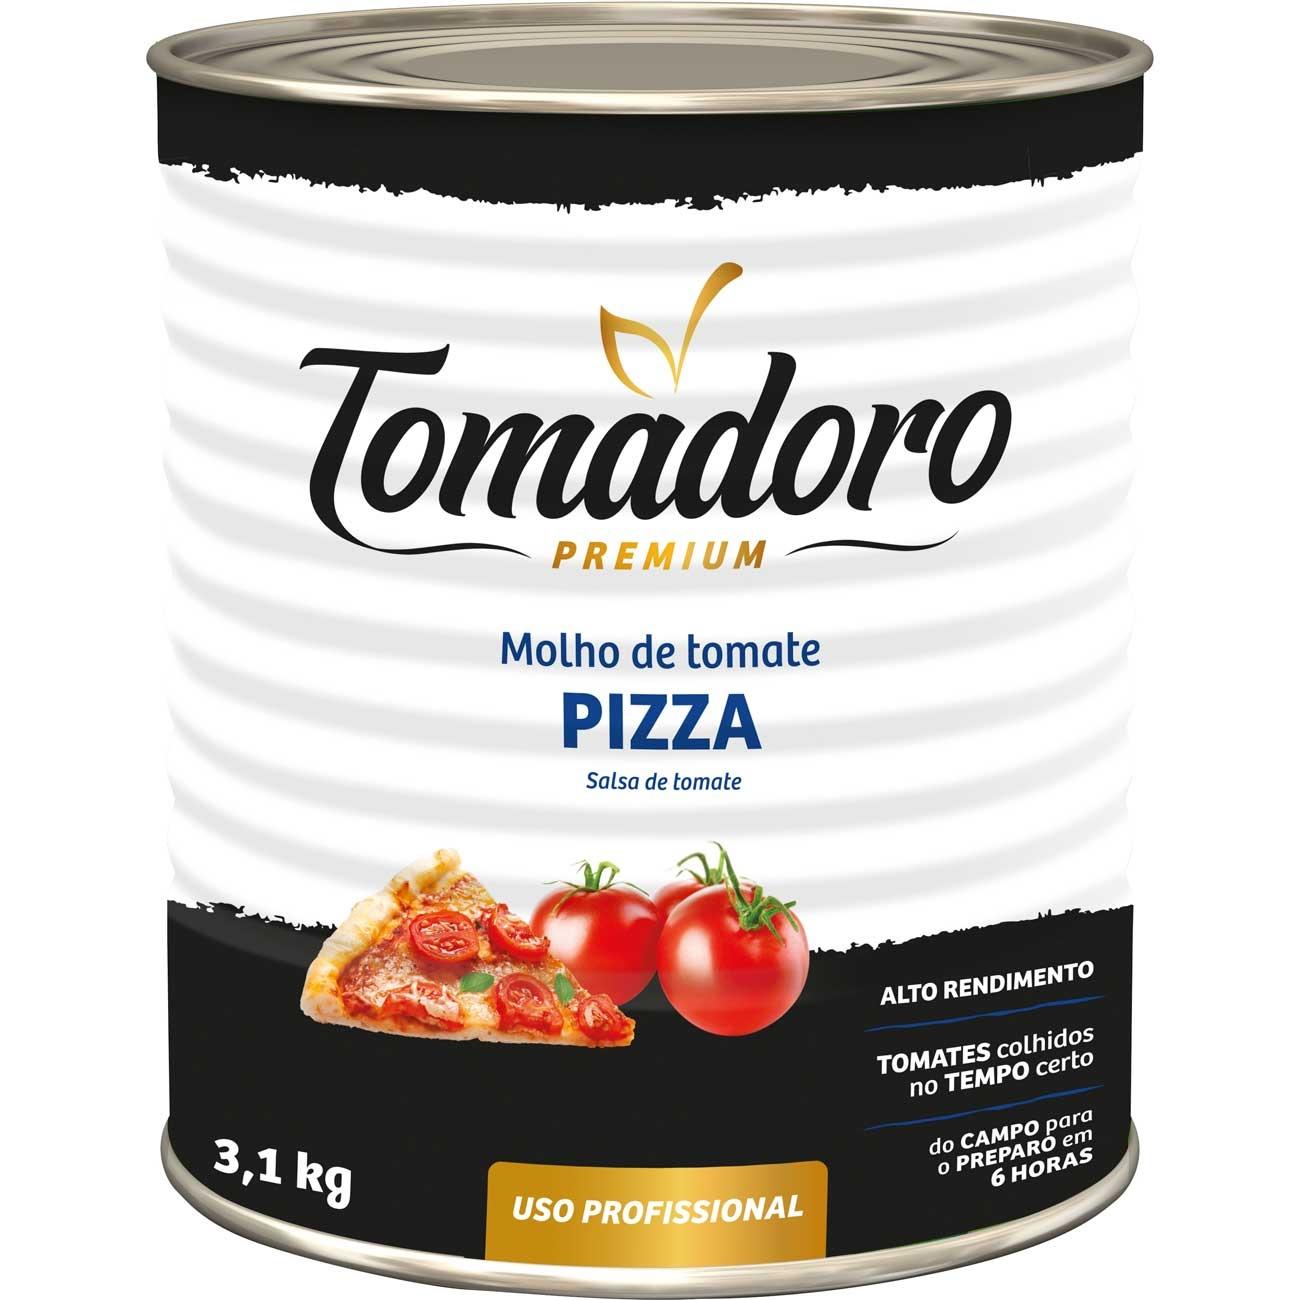 Molho De Tomate Tomadoro Premium Pizza Lata 3.1kg